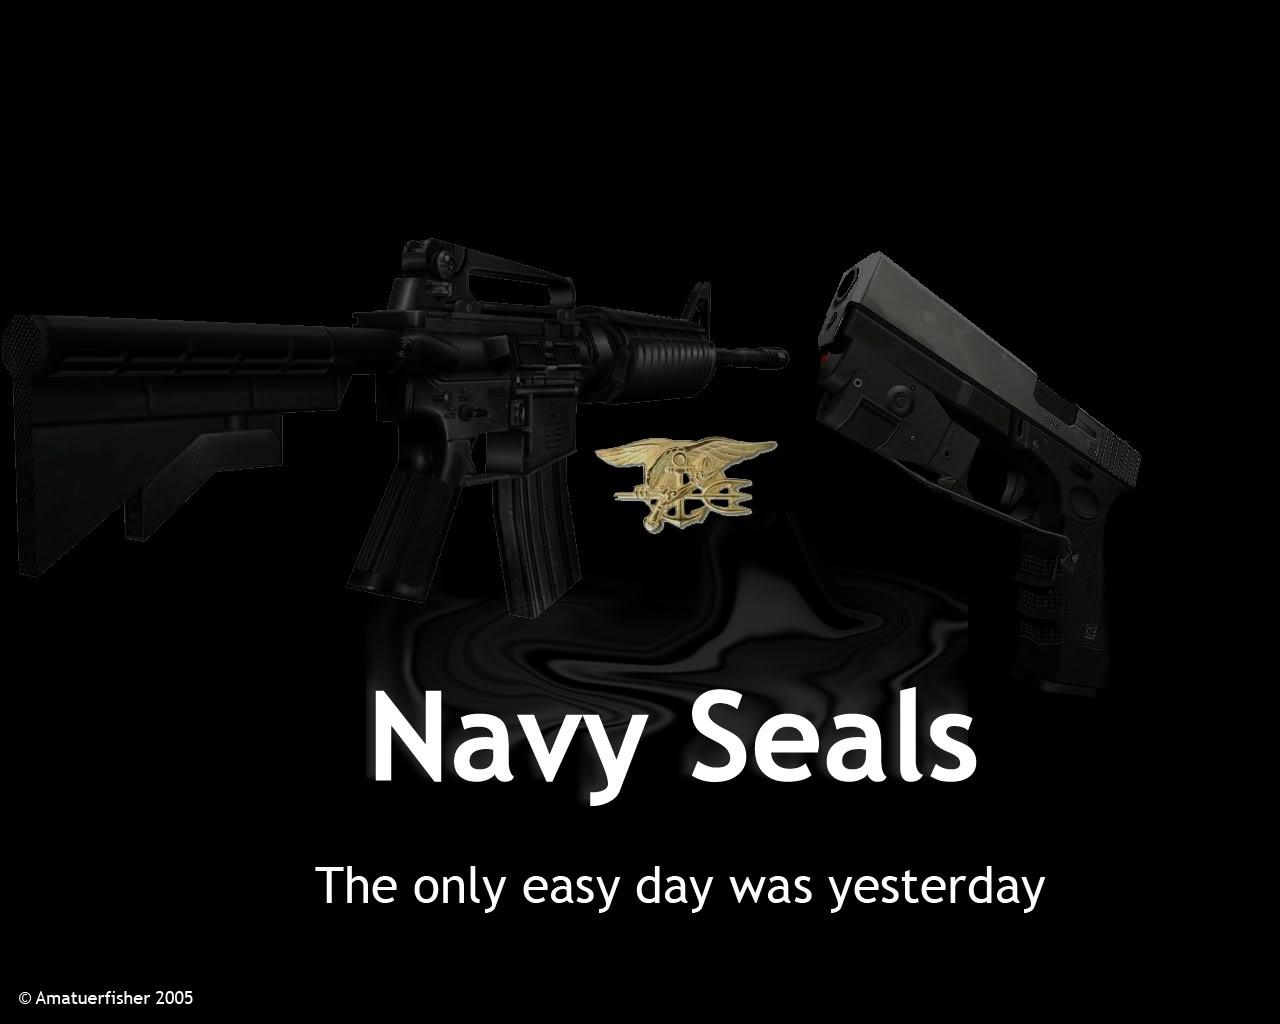 US Navy Seals Wallpaper 04